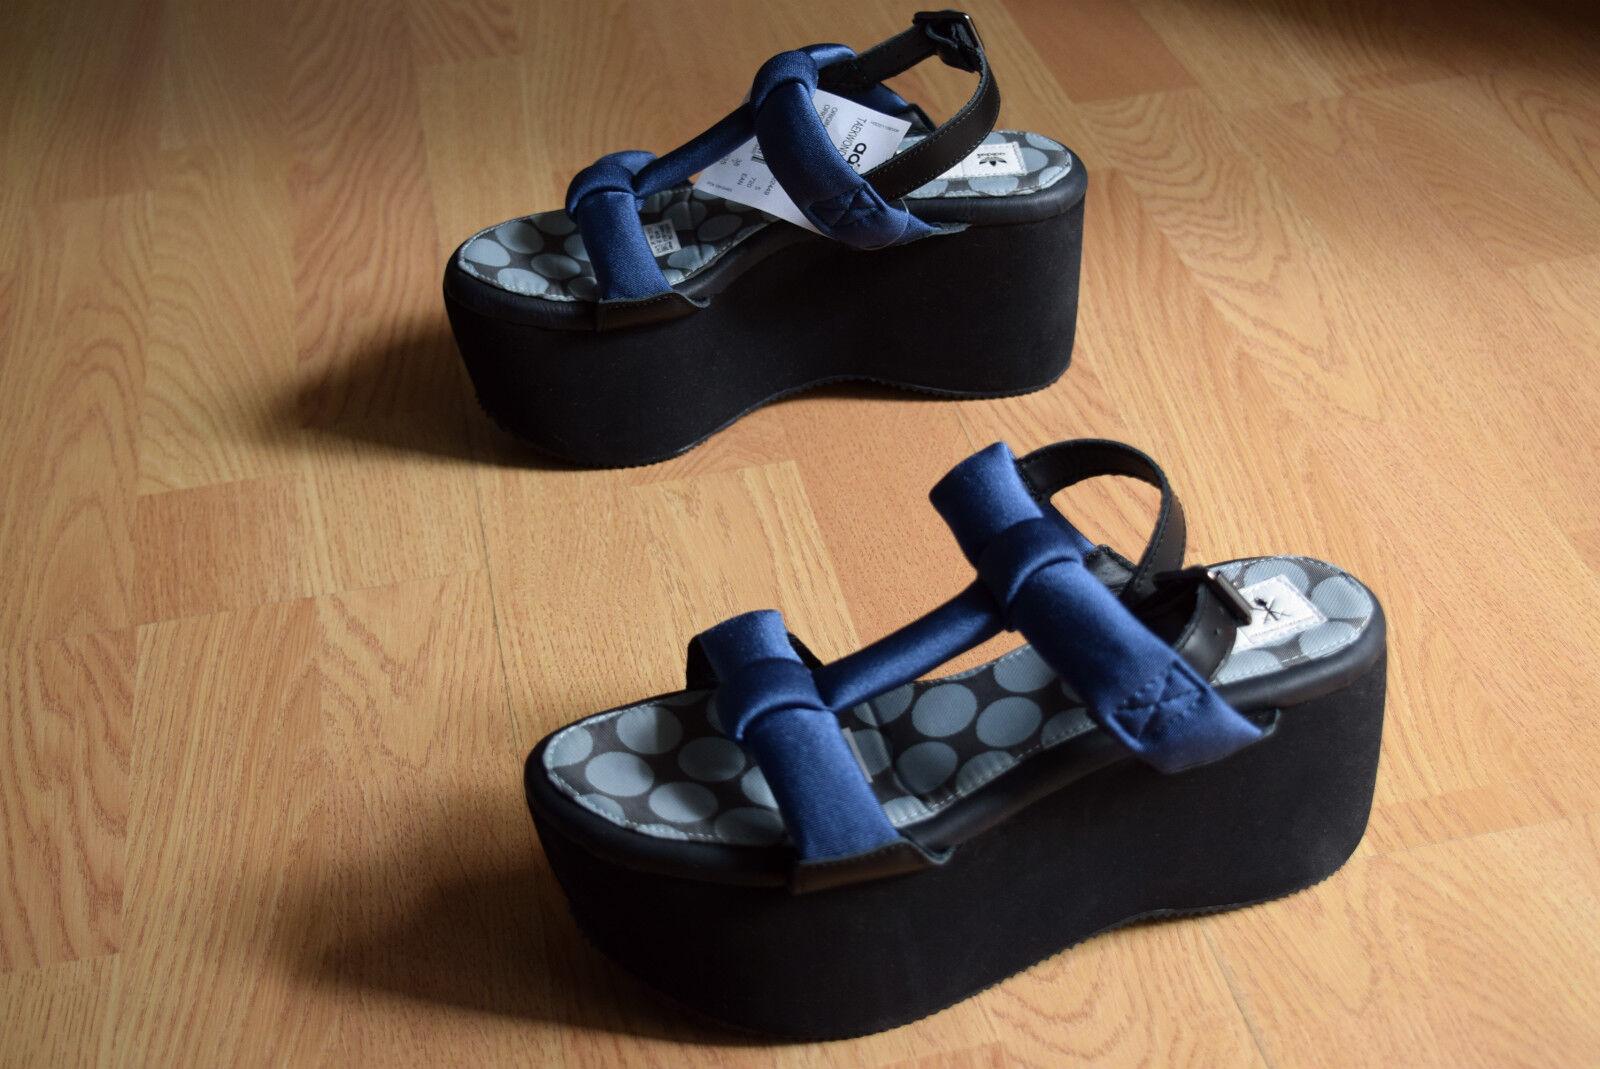 Adidas taekwondo plataforma 38 40,5 42 plataforma sandalias OC wedge up m22449